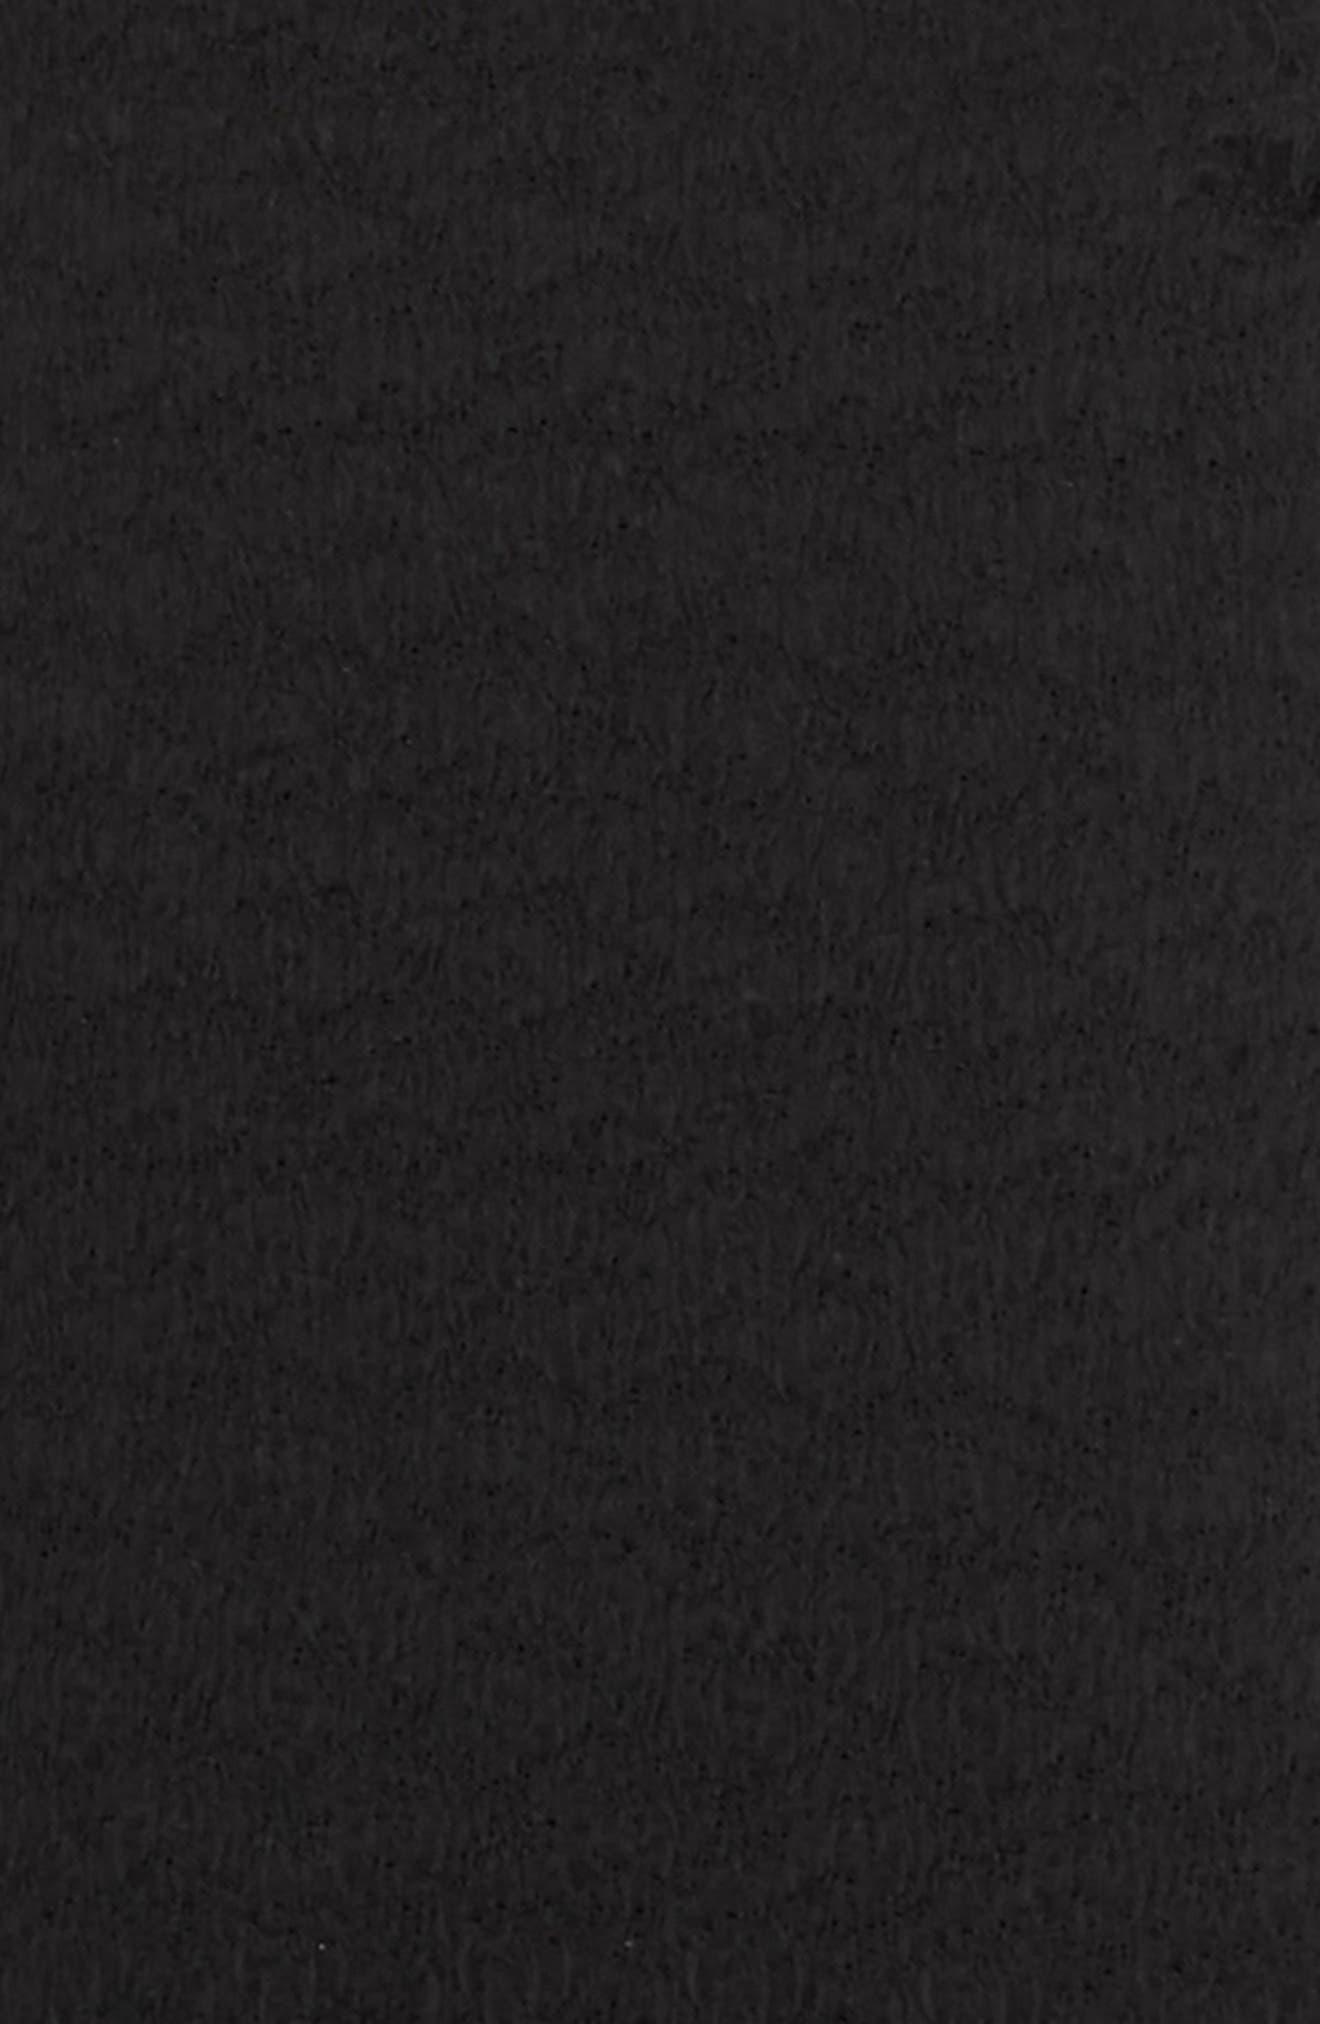 Alternate Image 3  - John Varvatos Collection Crinkled Wash Silk Scarf